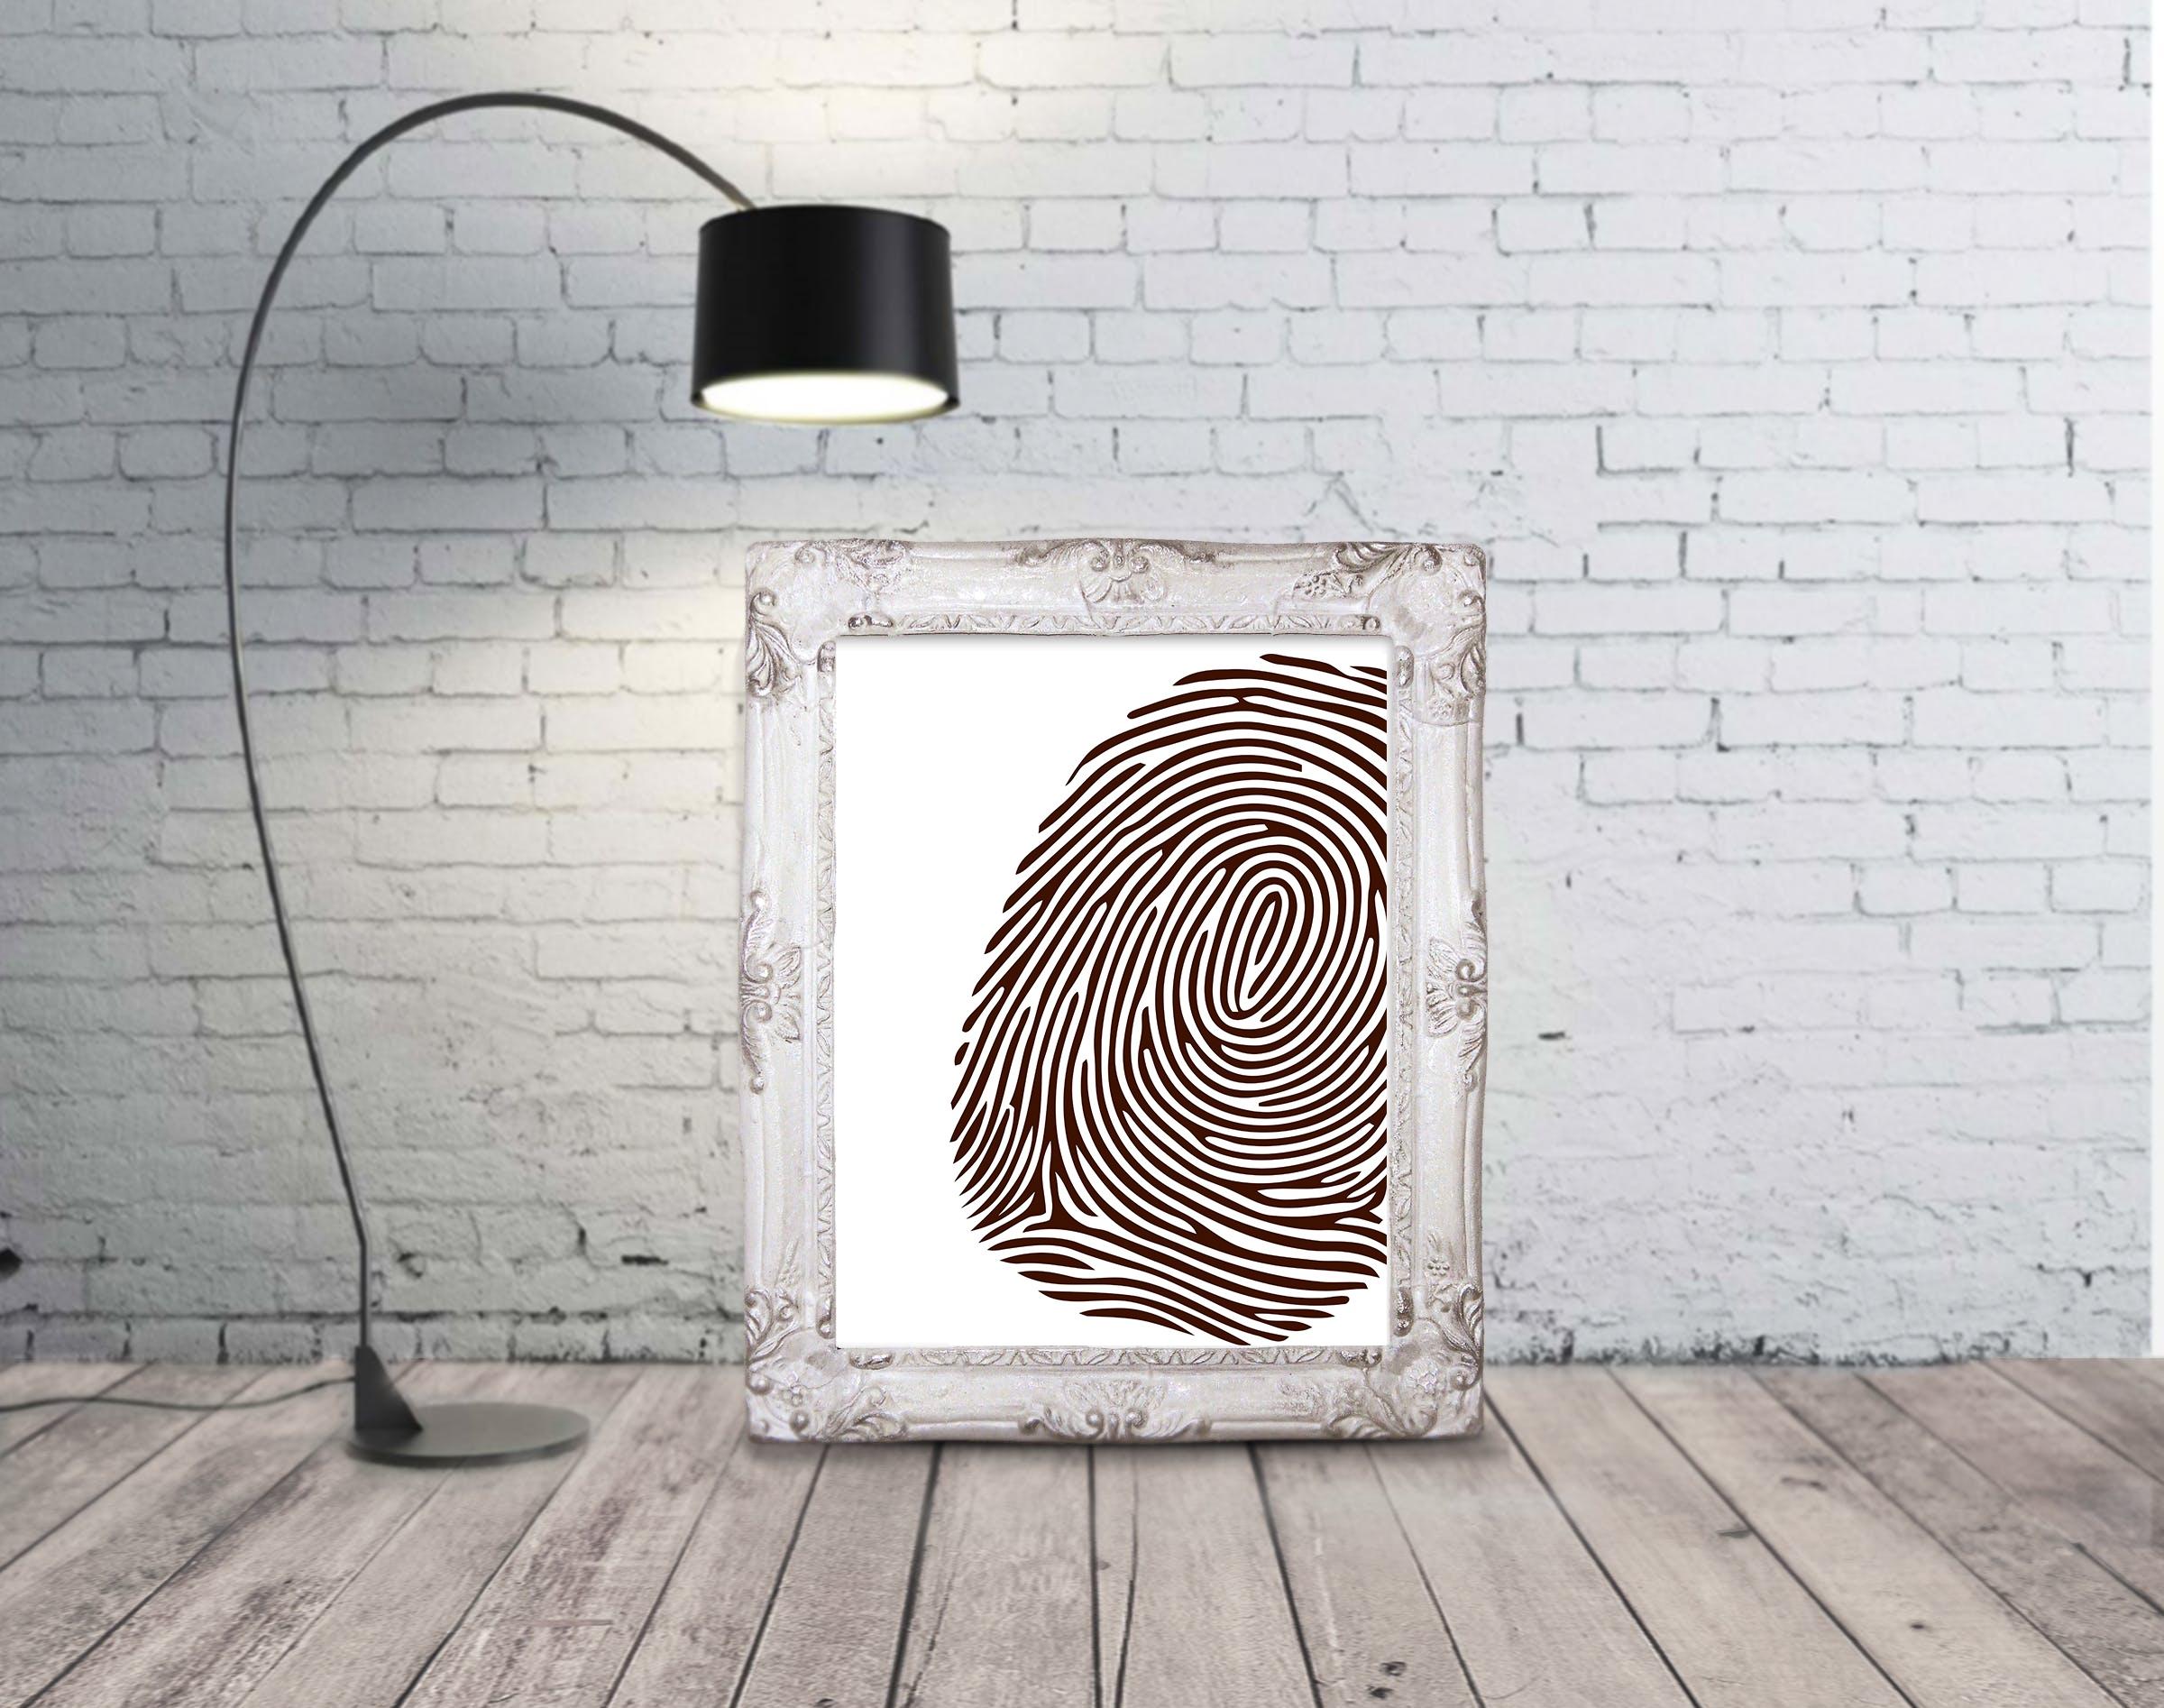 Laser Engraving Fingerprint Mockup Wall Art Free Vector